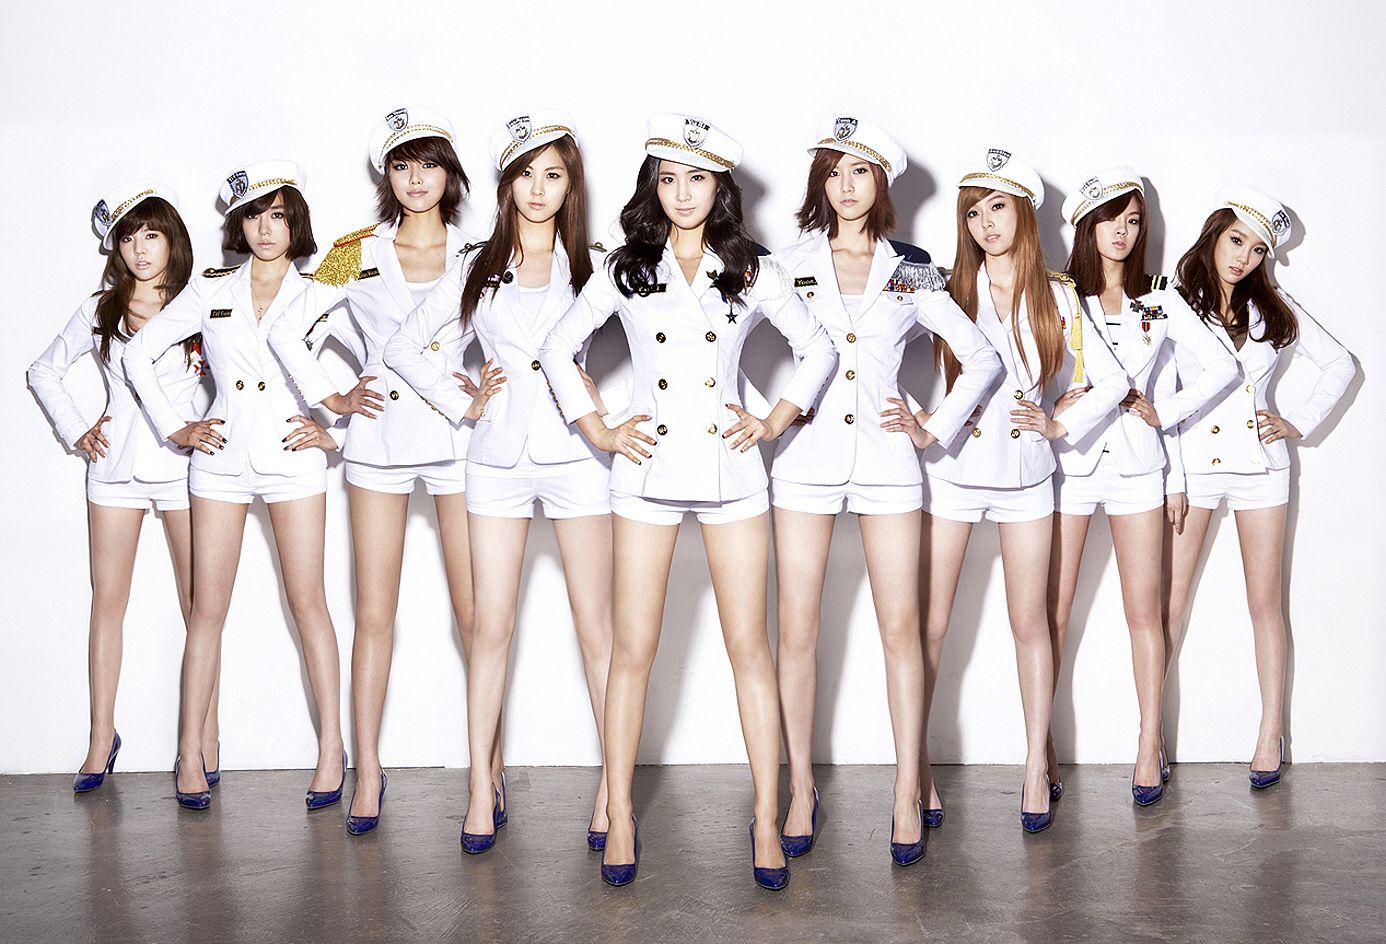 Hd wallpaper kpop - Tara Wallpaper Kpop In Hd